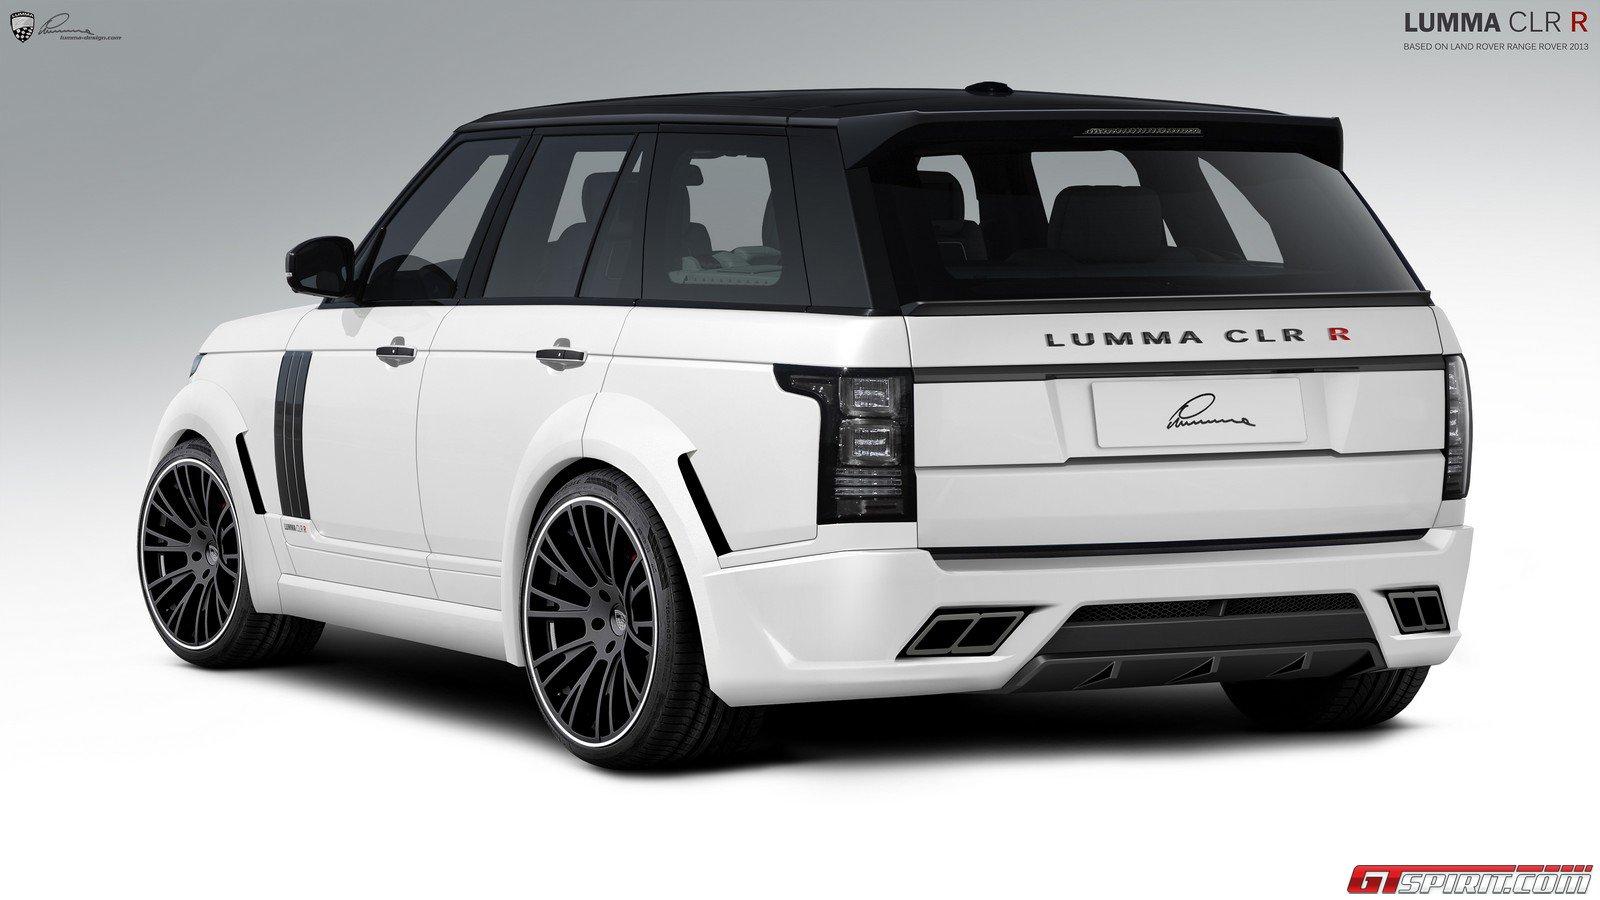 Lumma Design Range Rover CLR R Car Pictures Wallpapers Backgrounds